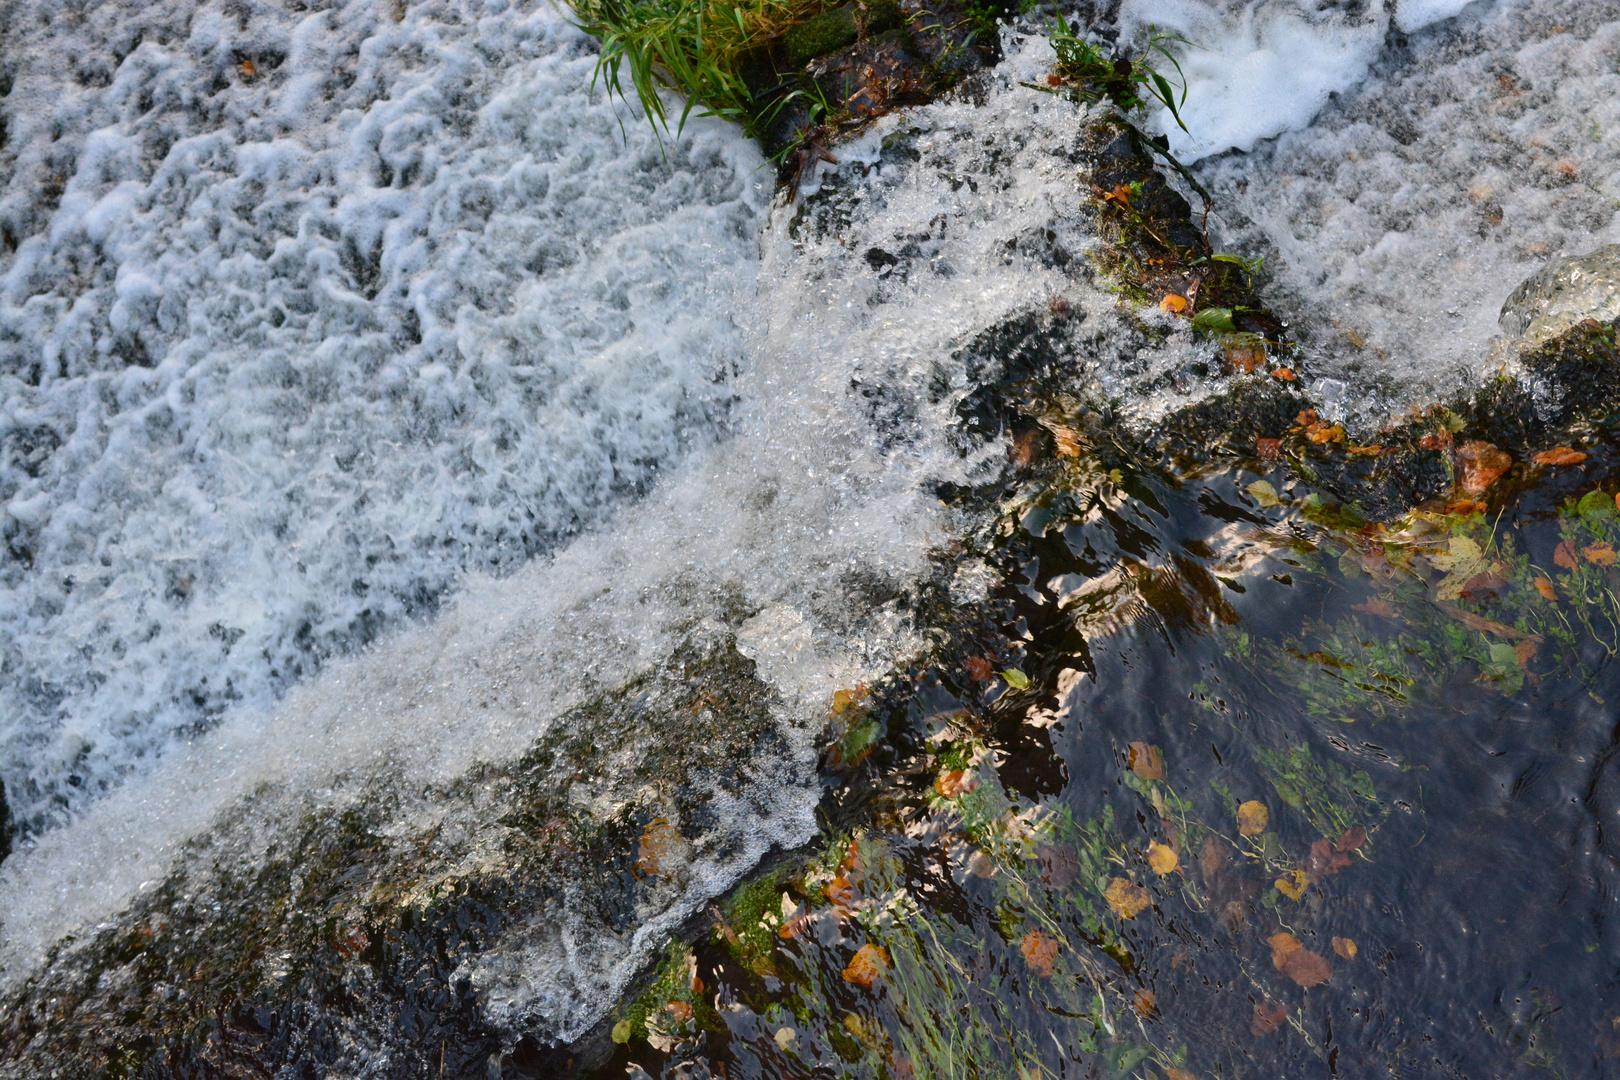 Tegeler Fließ